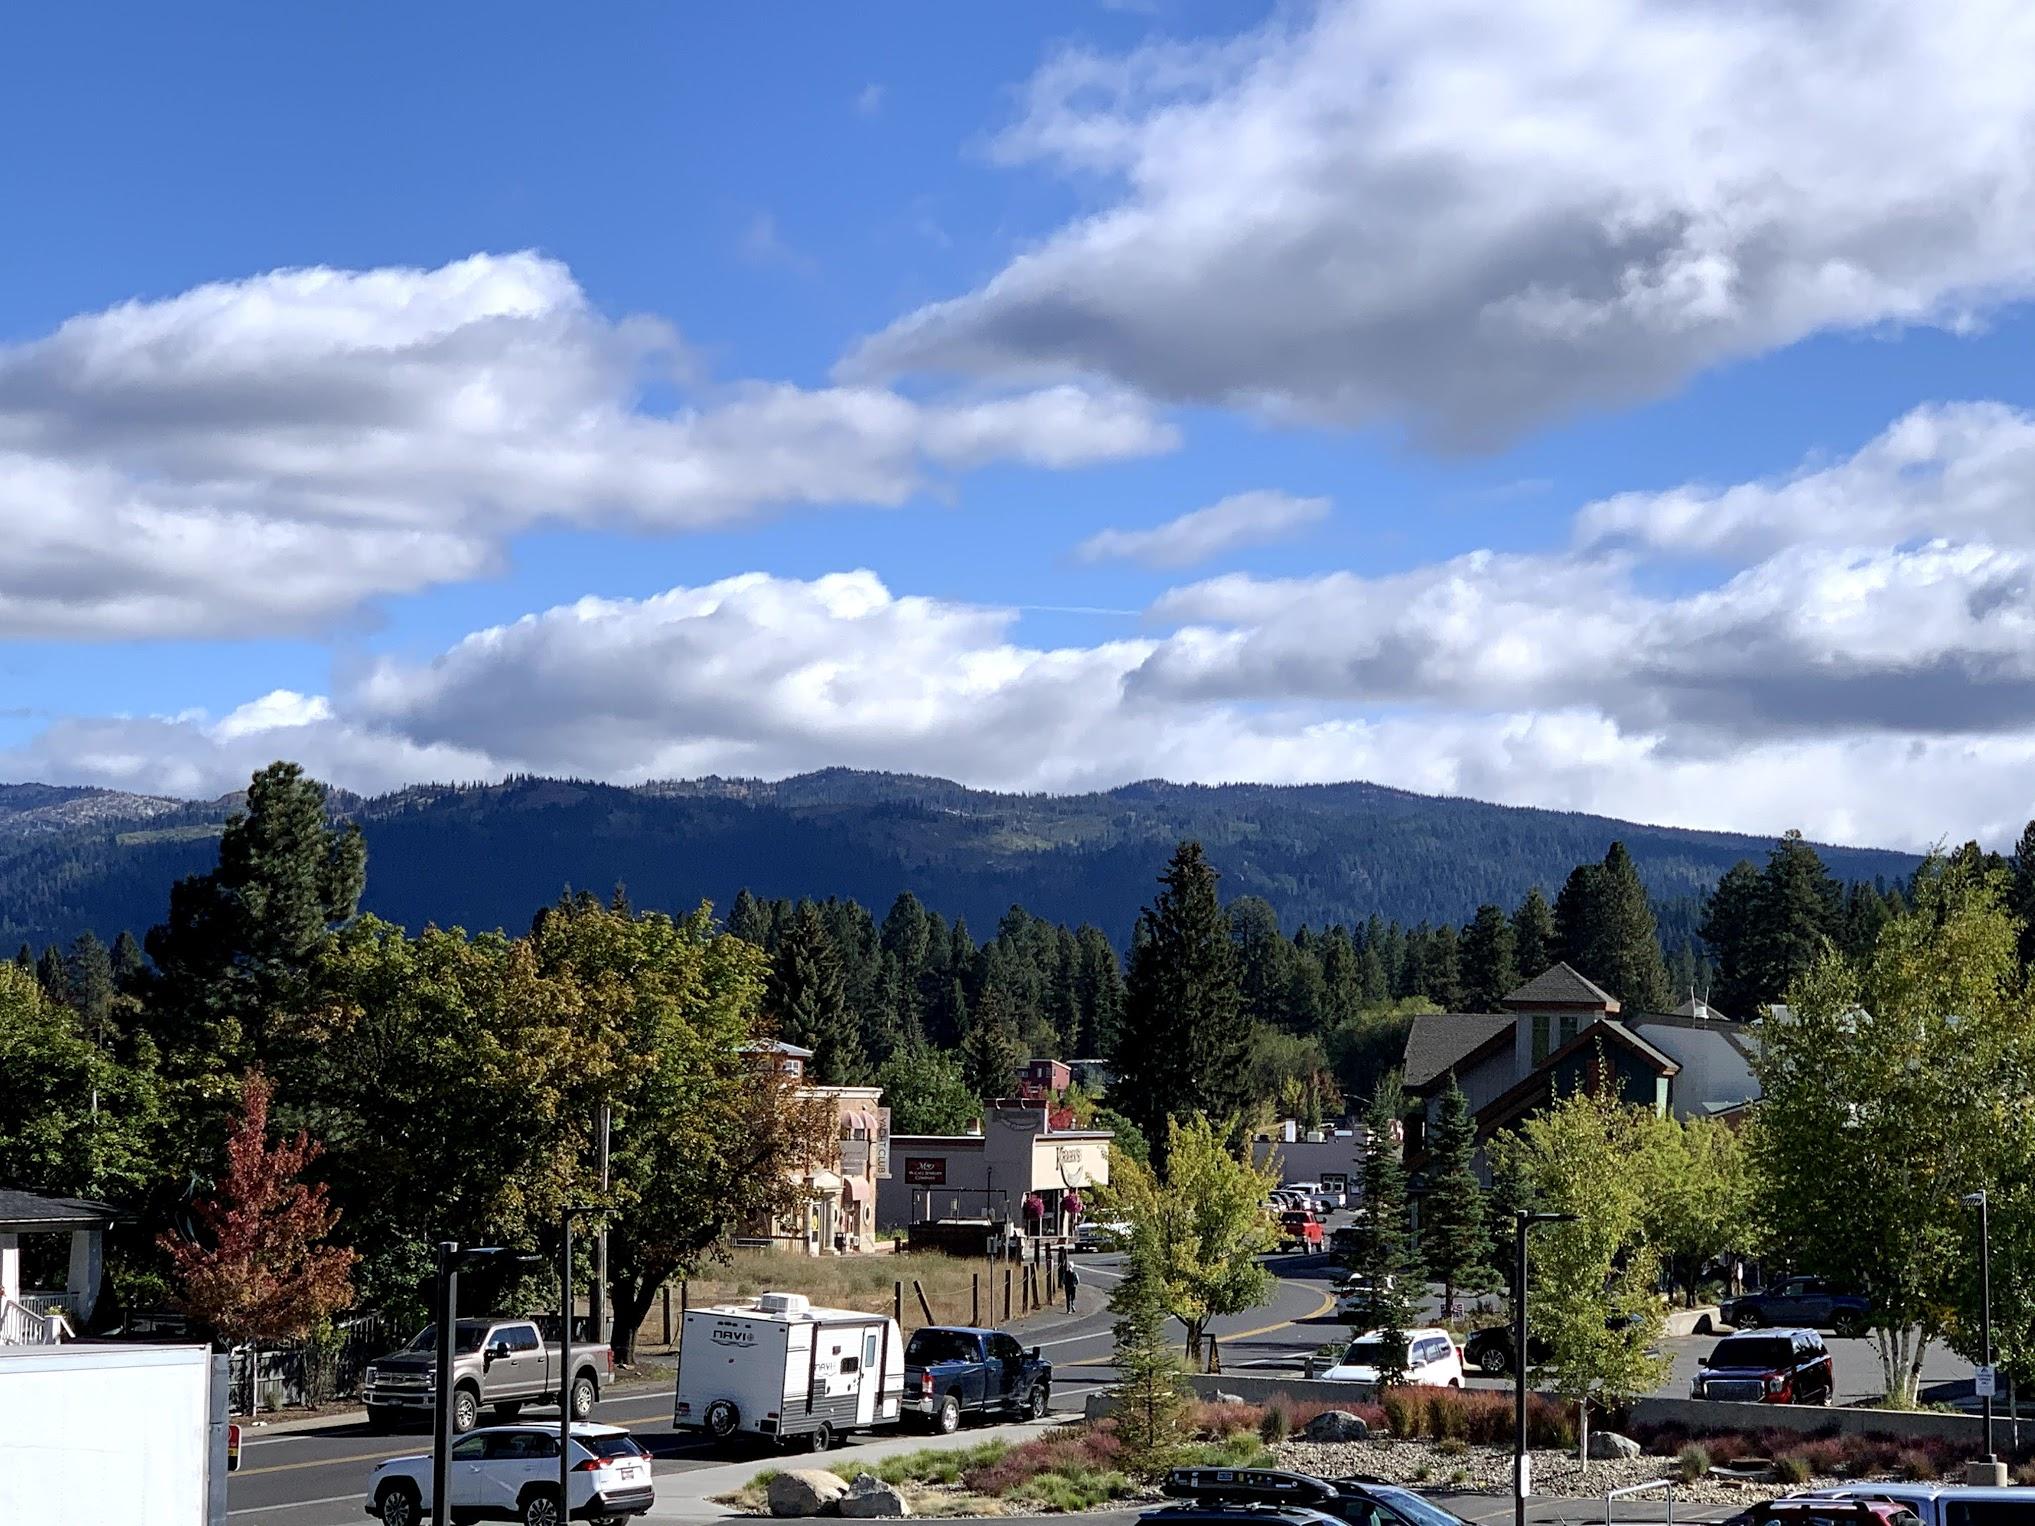 McCall, Idaho - home of Sharlie